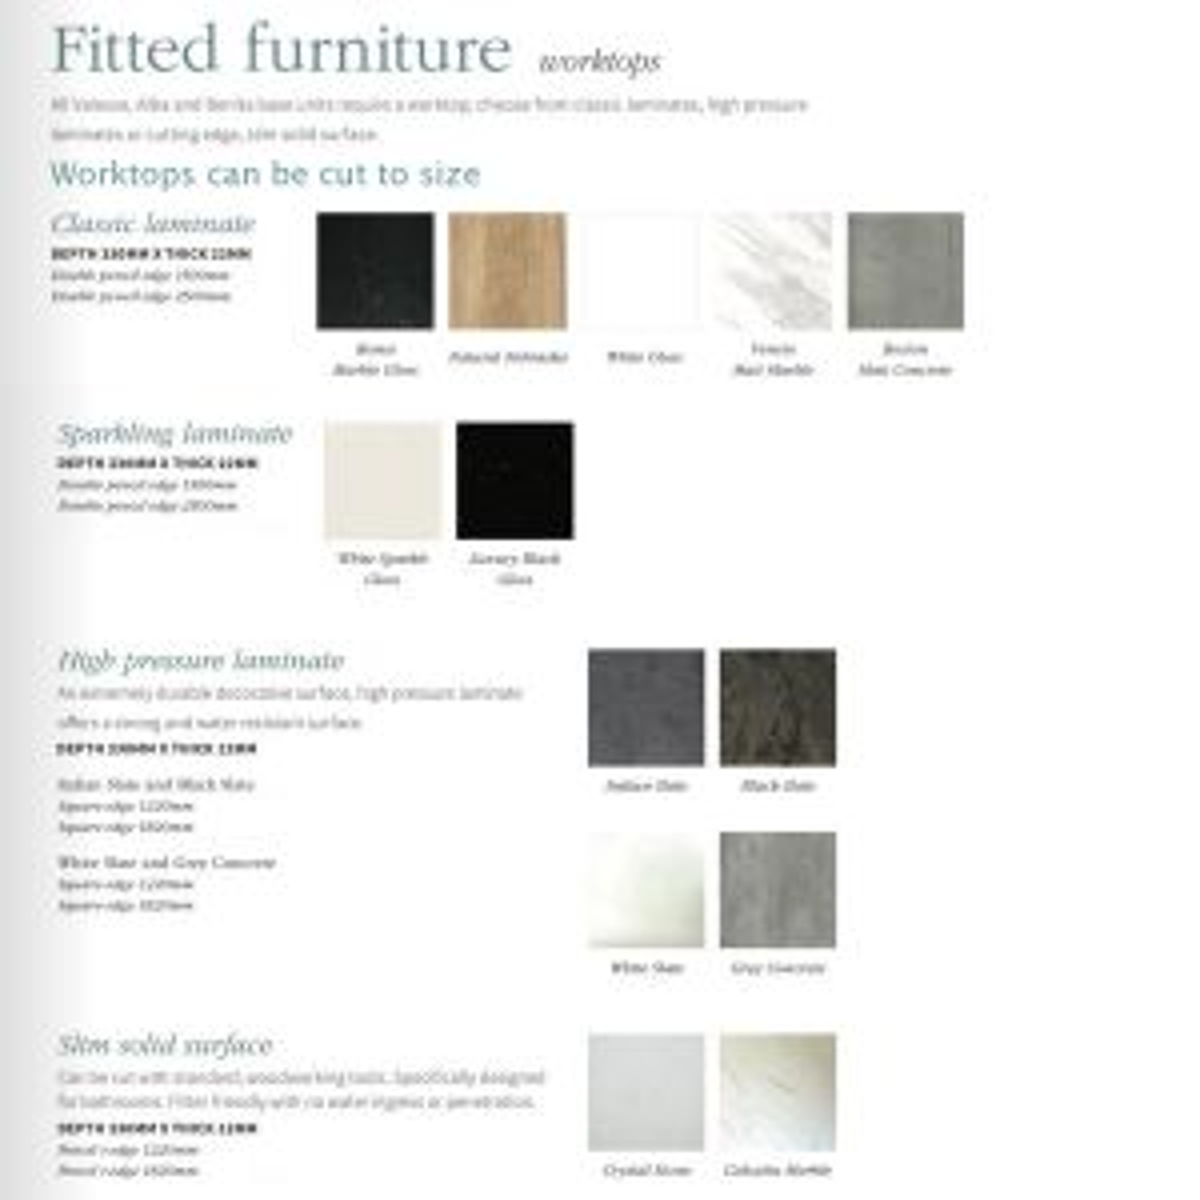 BTL Fitted Furniture Worktops